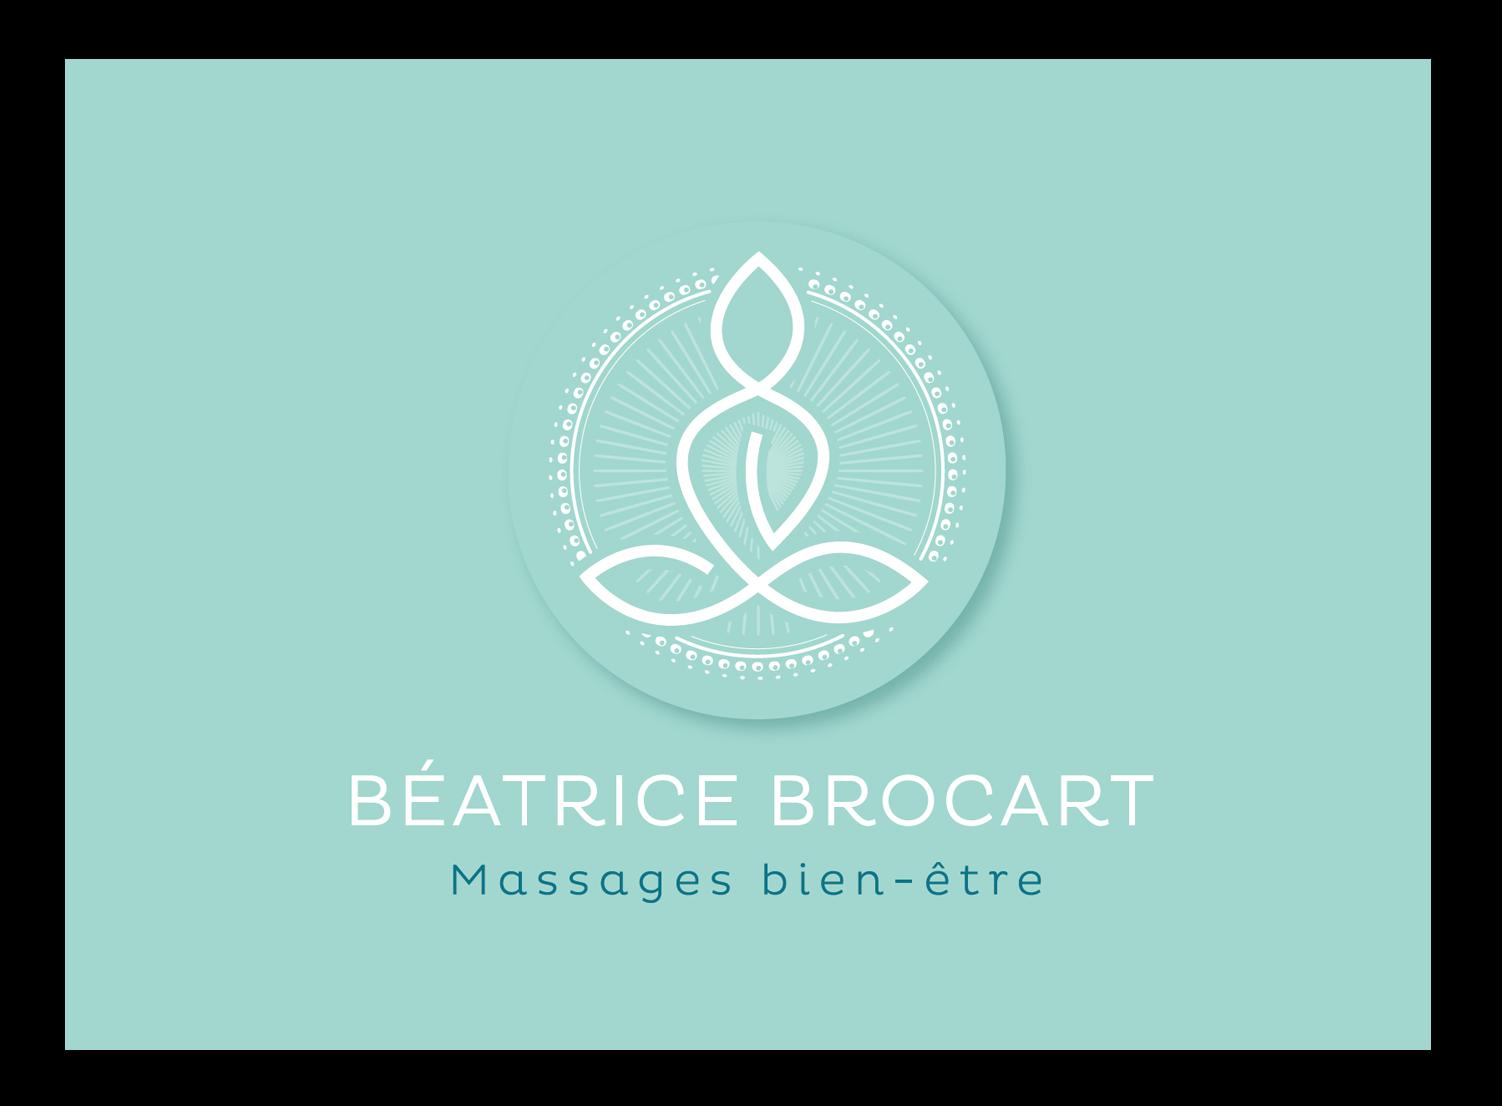 Béatrice Brocart